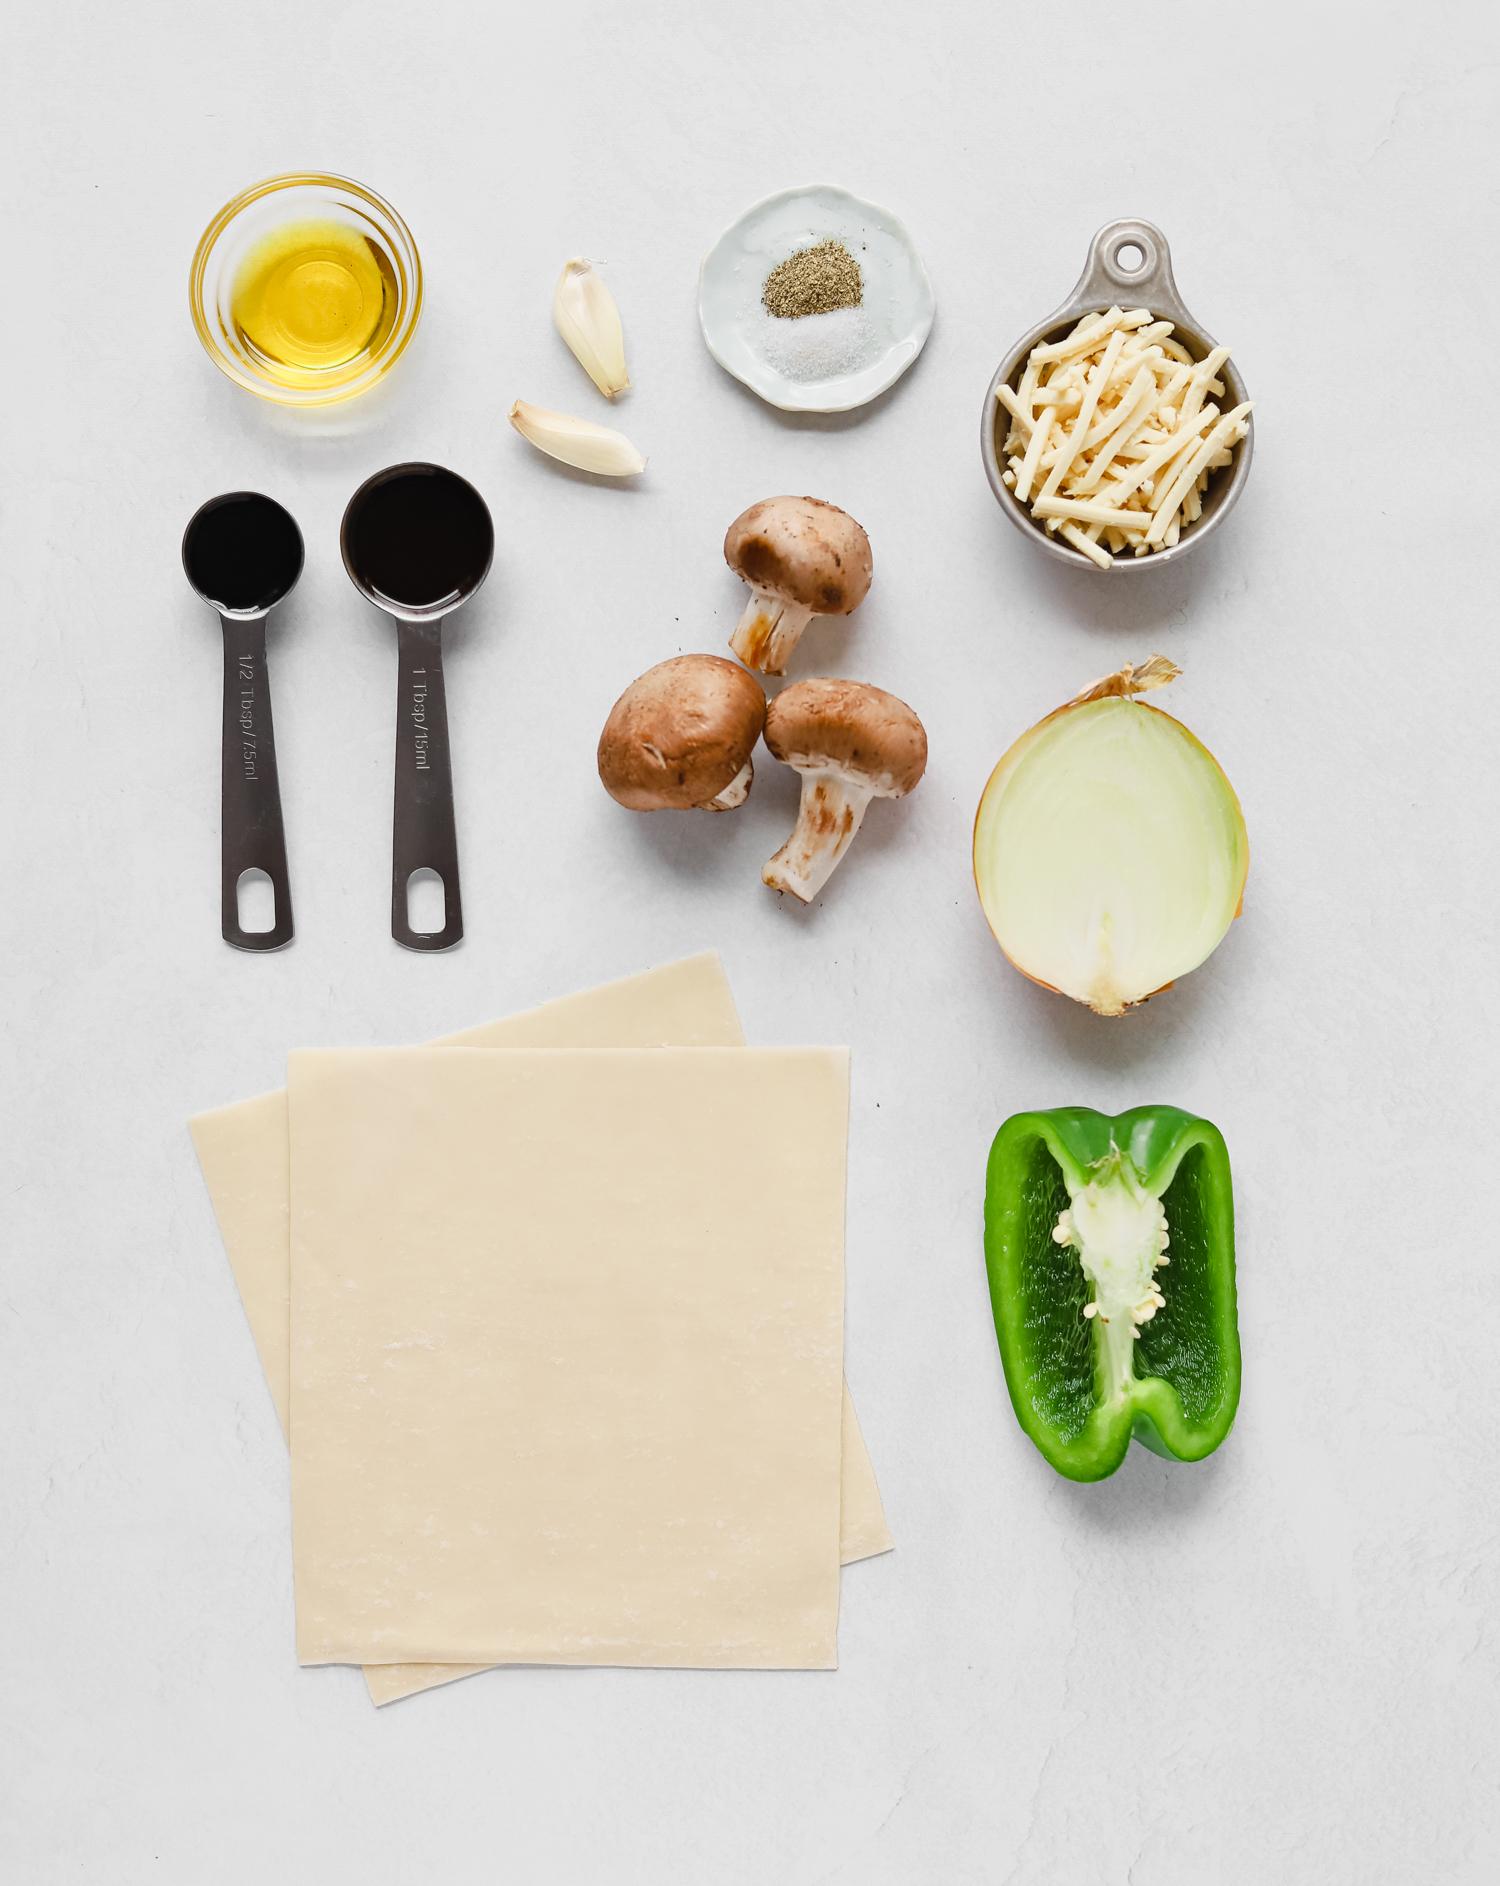 Ingredients to make mushroom phill cheesesteak egg rolls